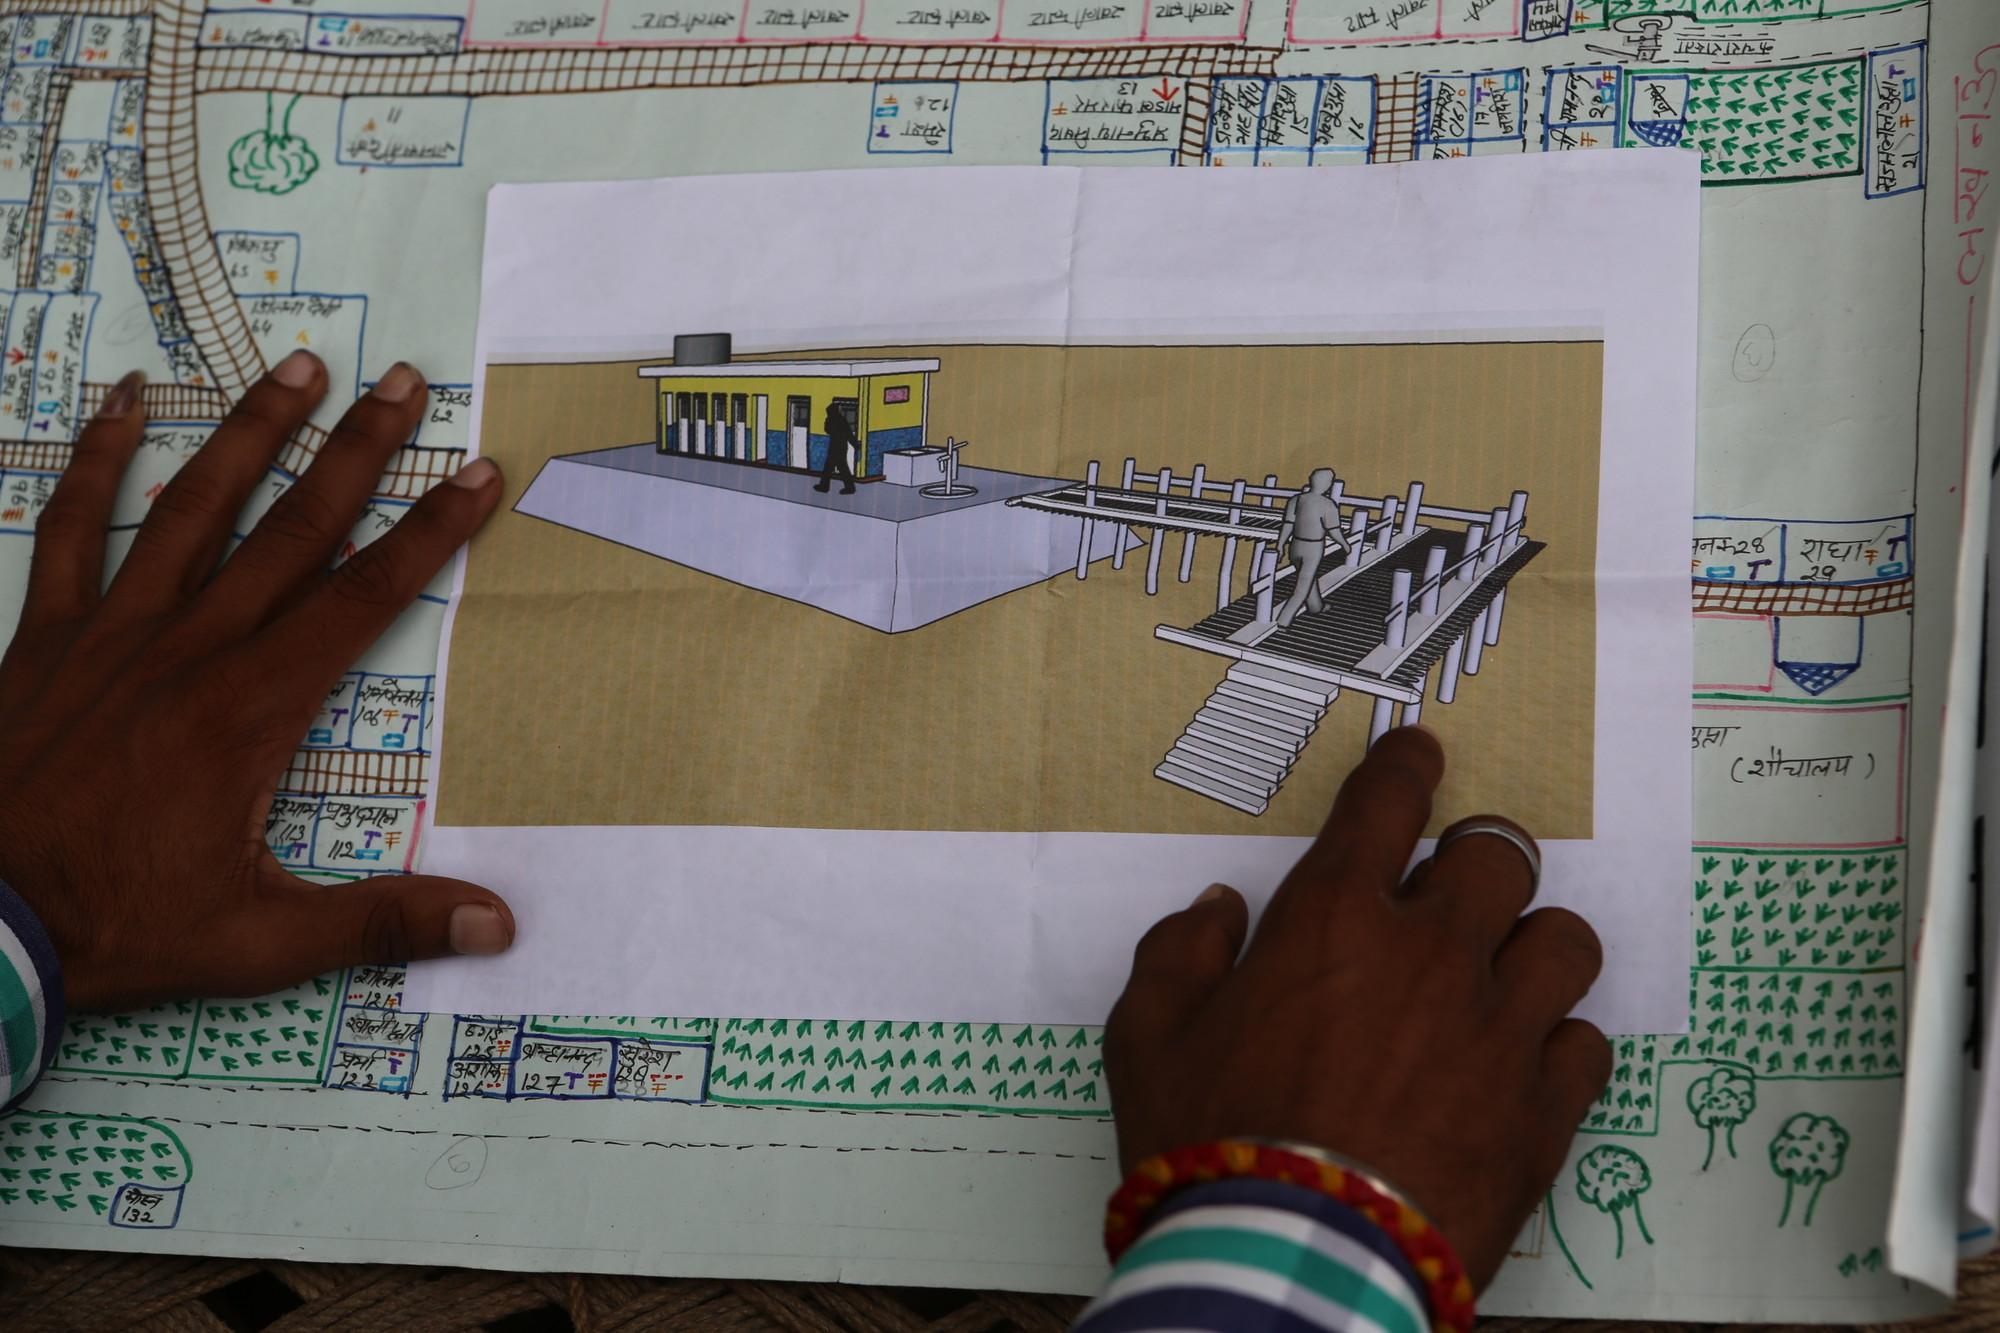 Proyectos de Viviendas Resilientes para India. Image © ONU